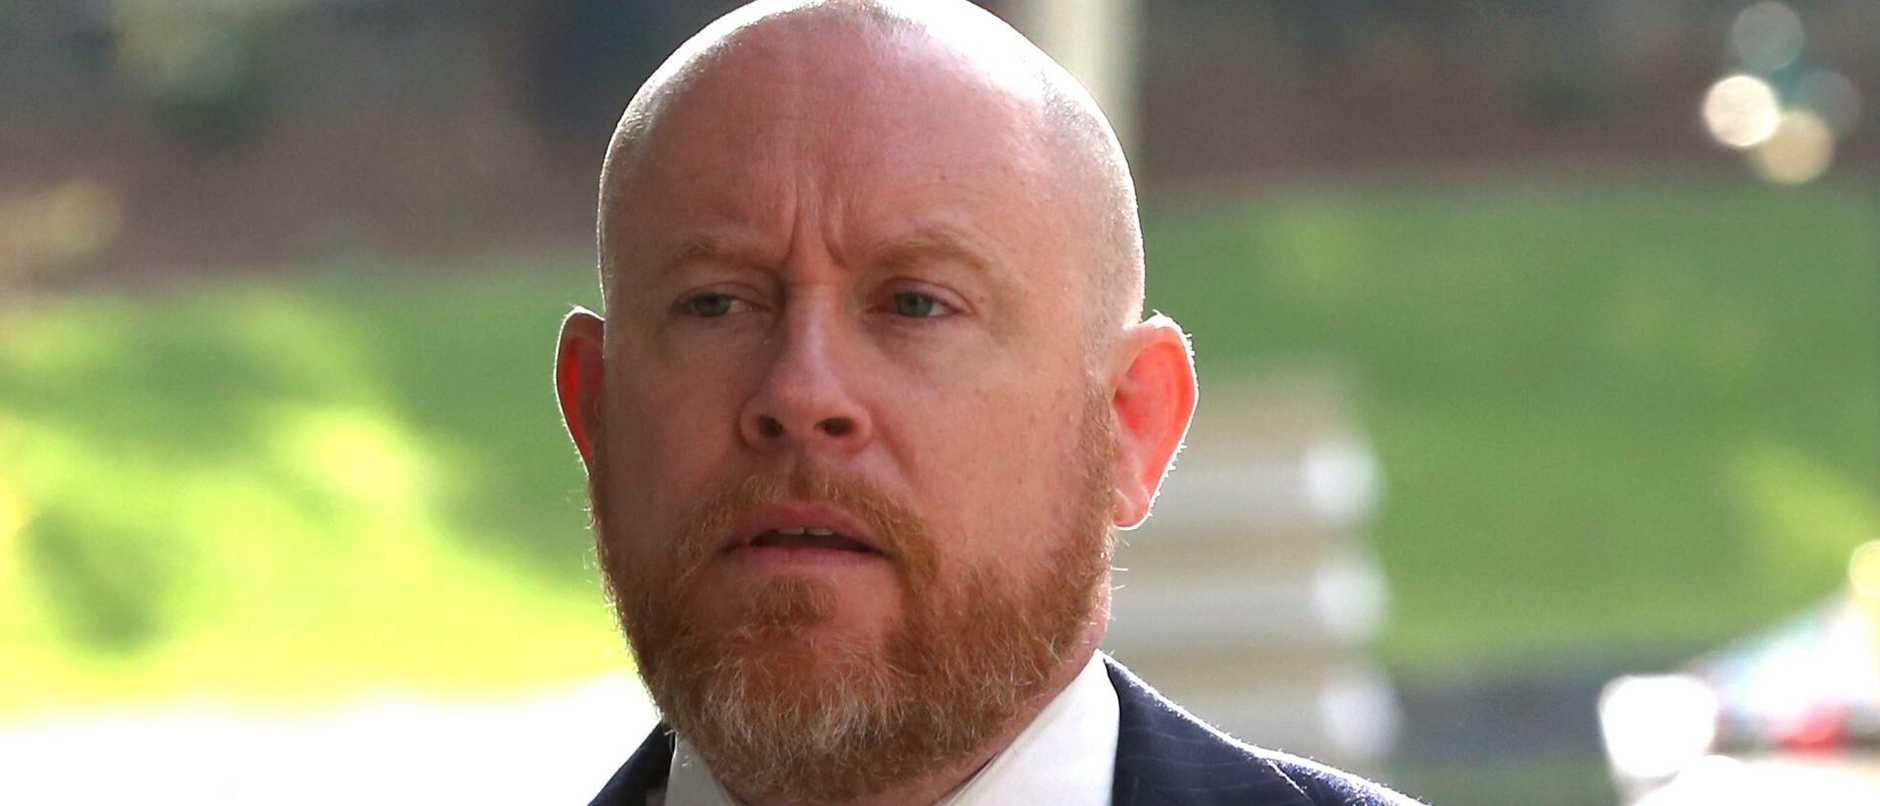 Tim Meehan's high-profile clients included Daniel Morcombe's killer Brett Cowan.